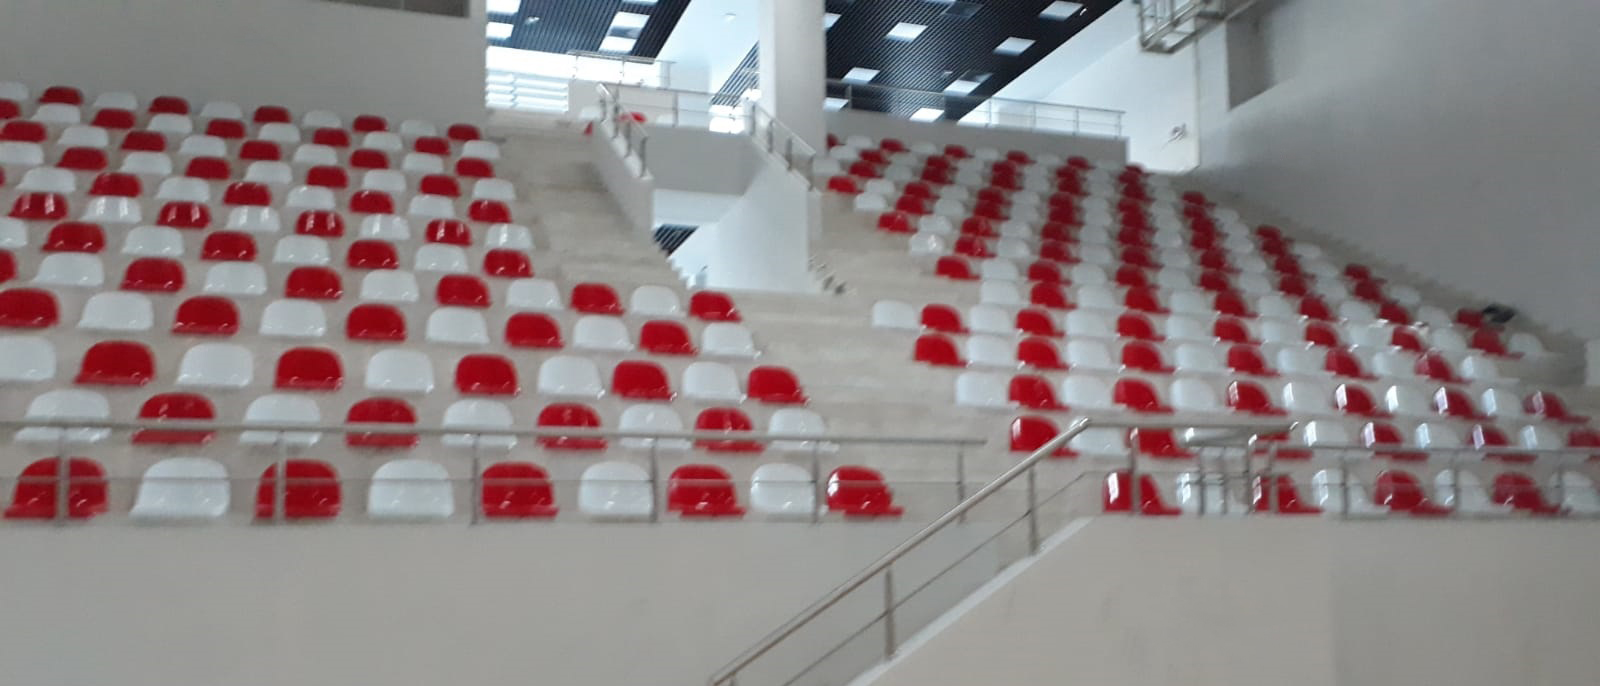 Küçükköy Indoor Sports Hall / İstanbul